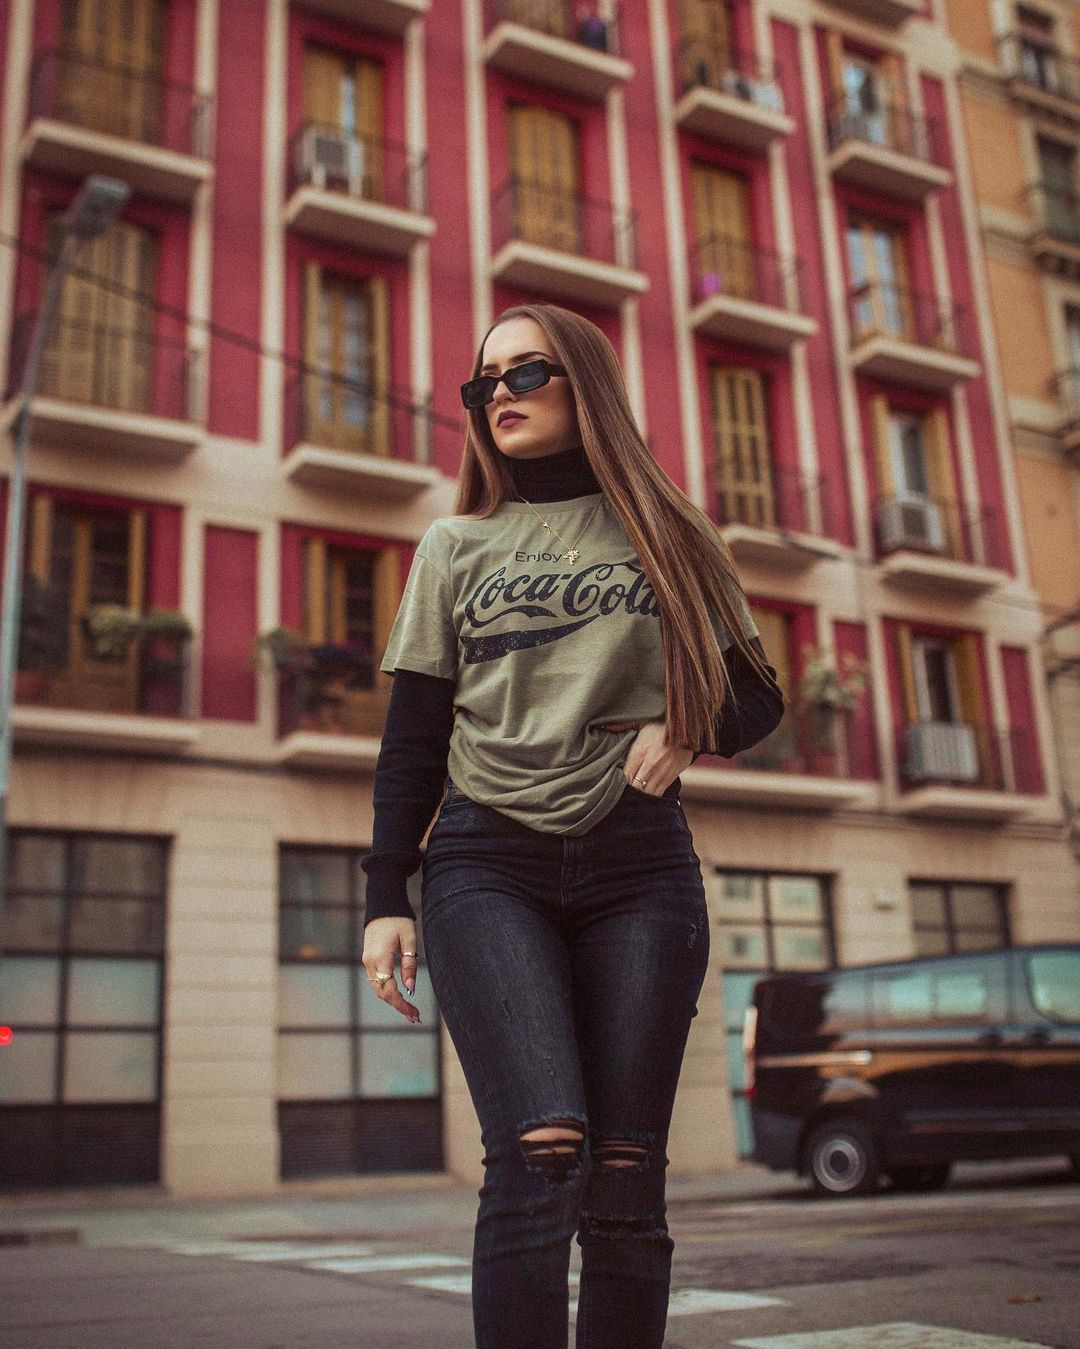 Lidia-Rauet-Wallpapers-Insta-Fit-Bio-6